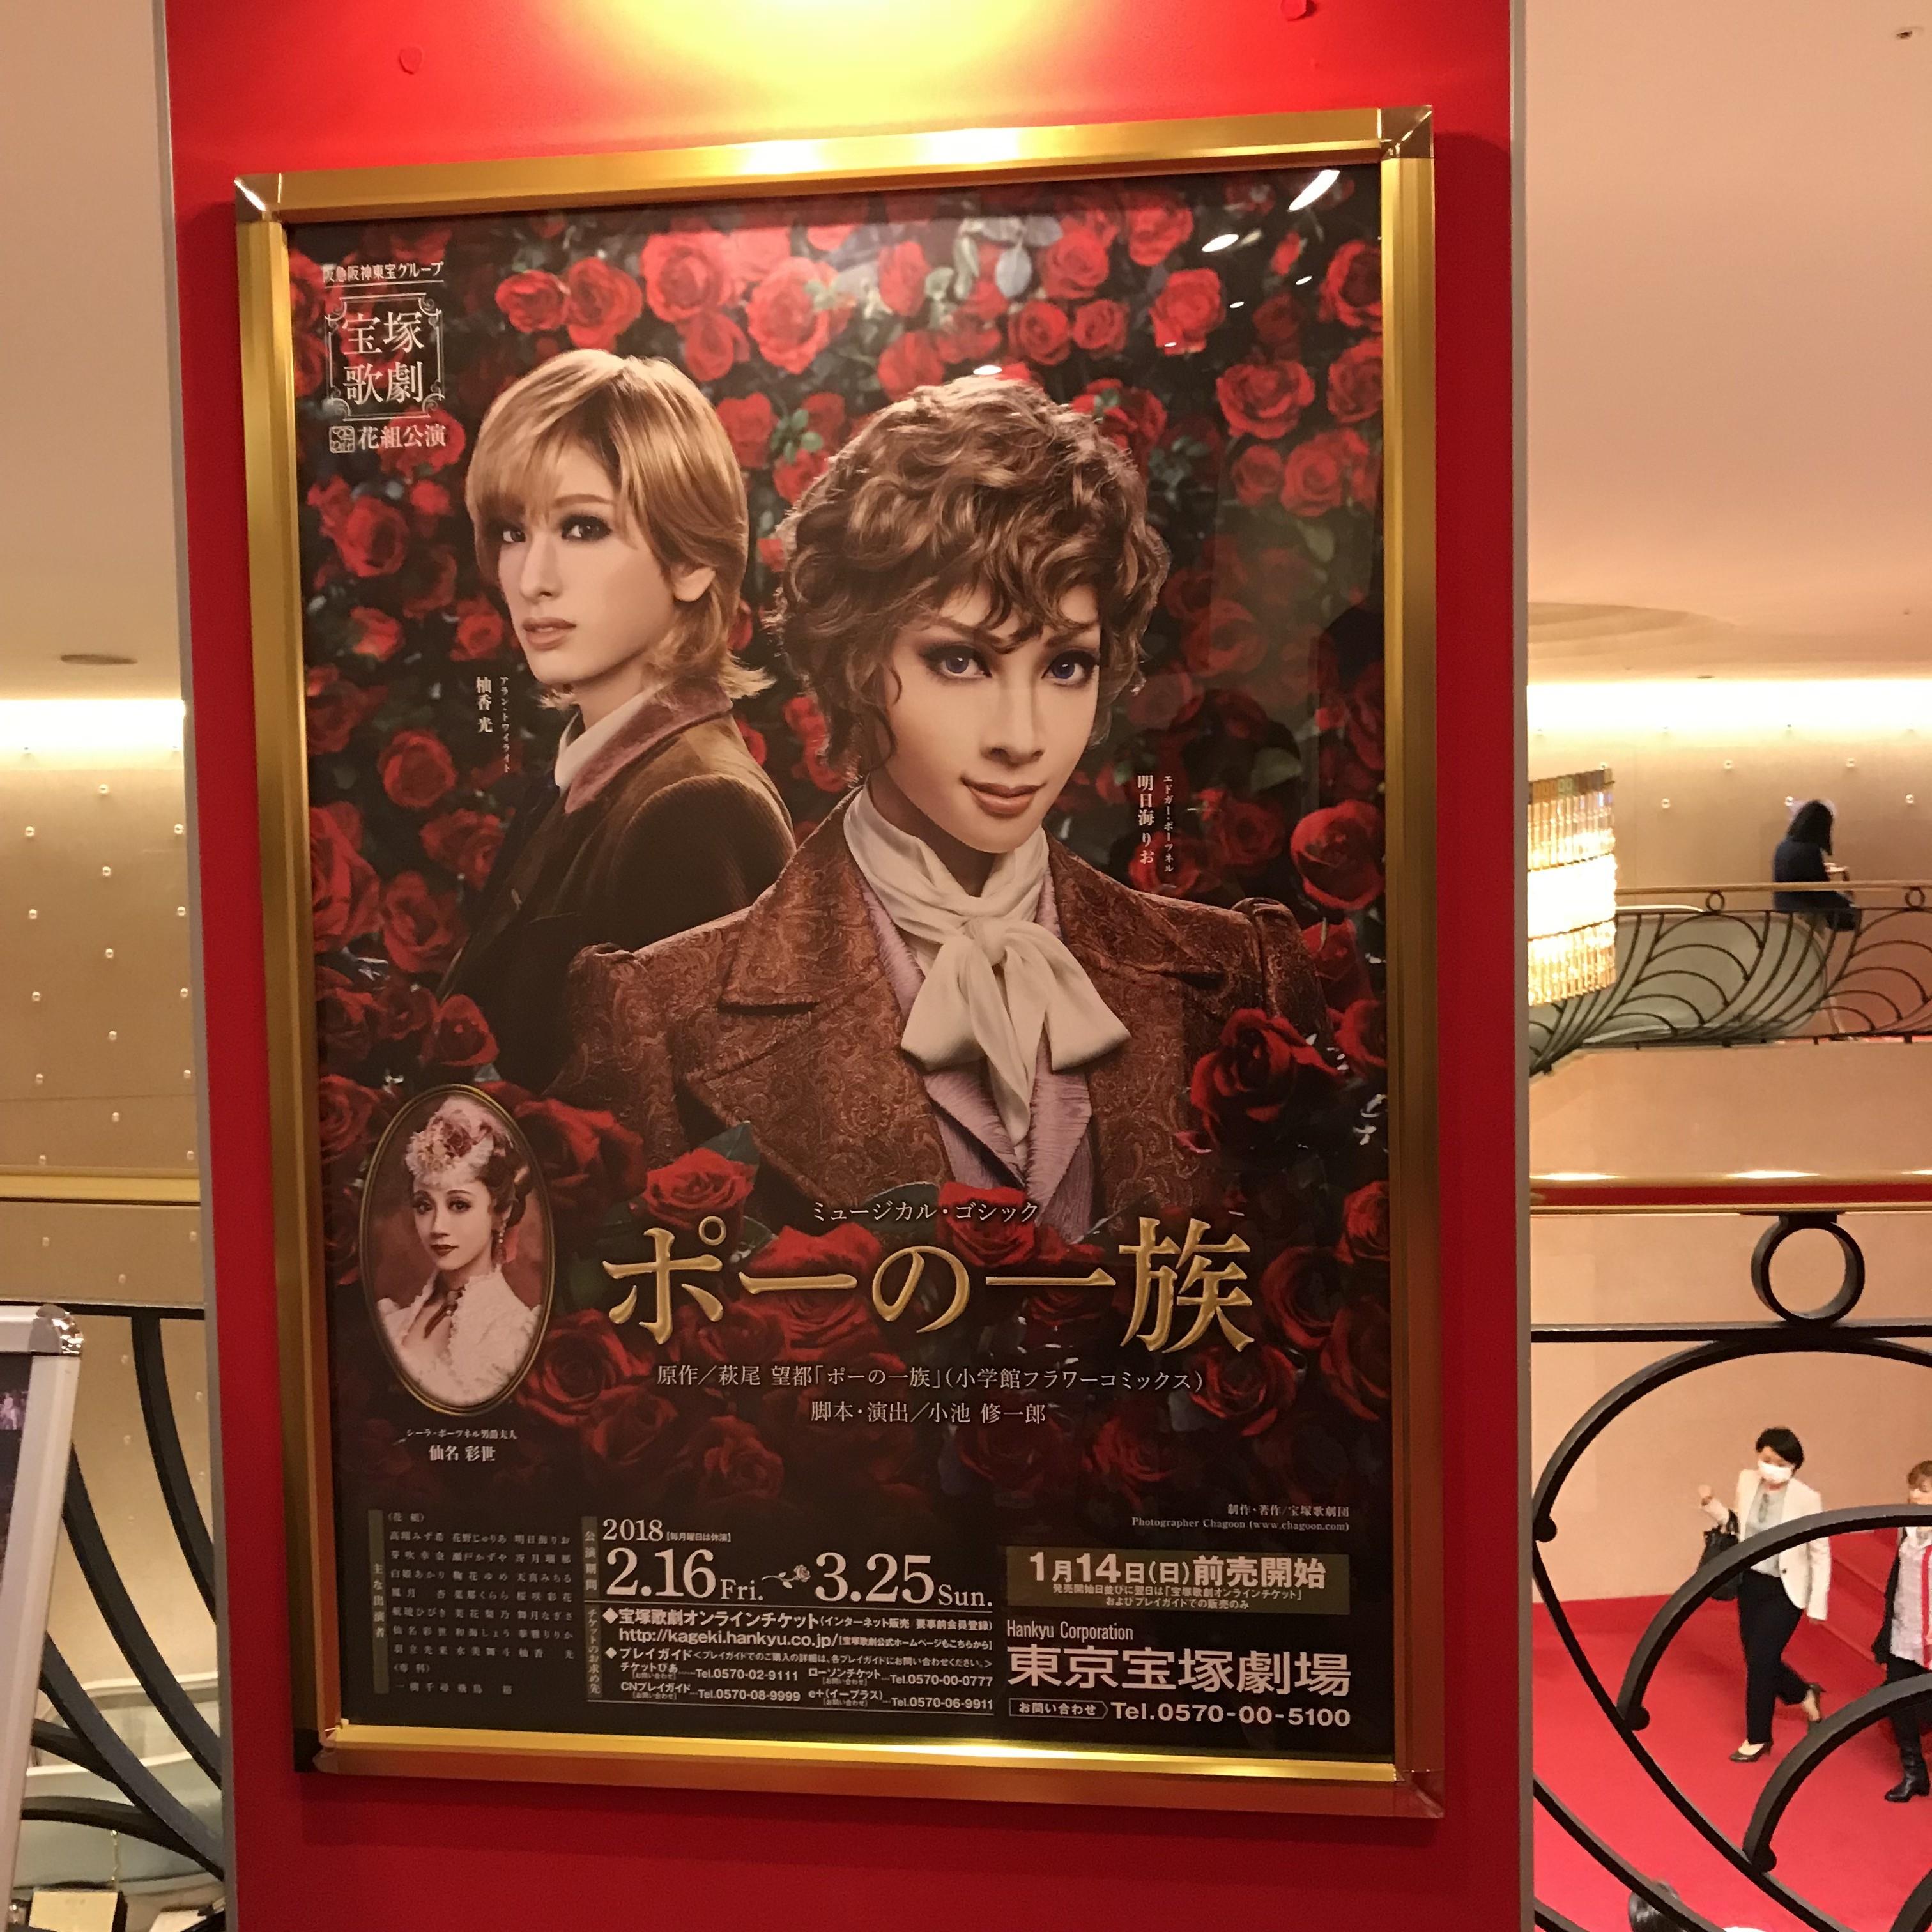 宝塚歌劇花組「ポーの一族」My First Takarazuka体験!